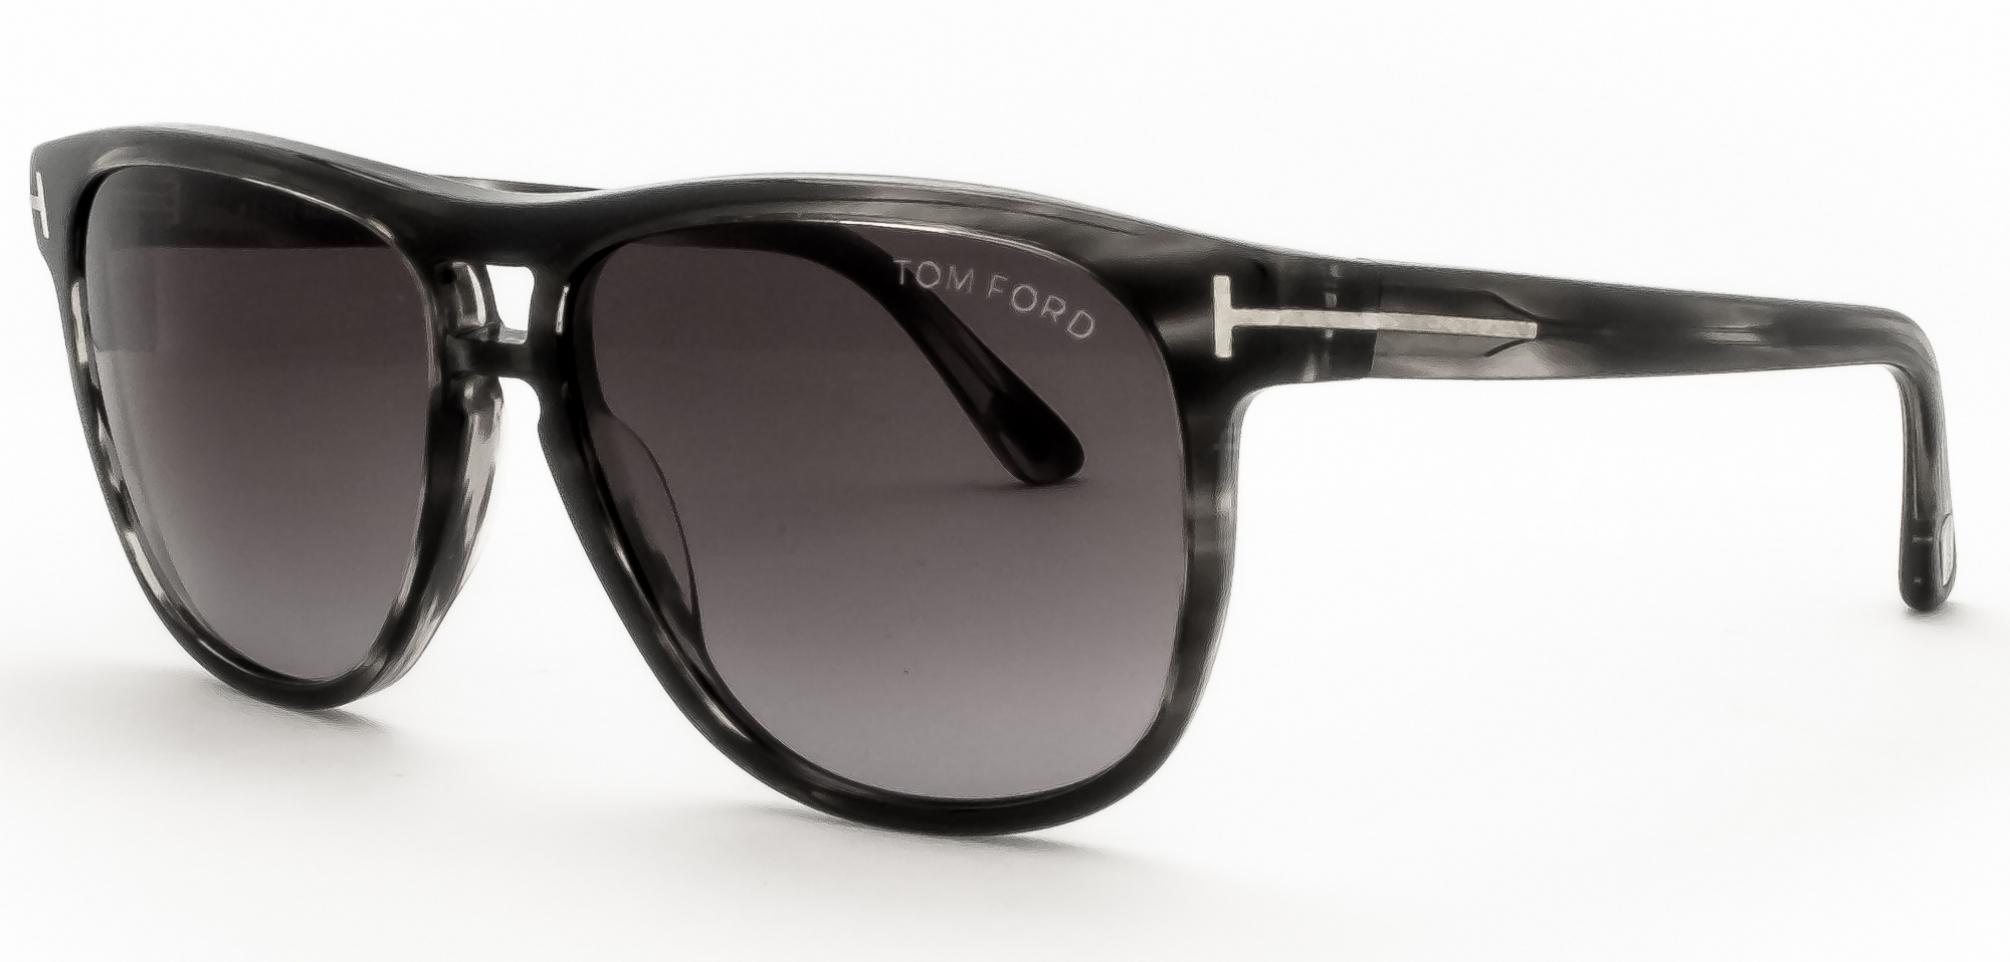 7a4edd2d12d19 Tom Ford Lennon Tf288 Sunglasses